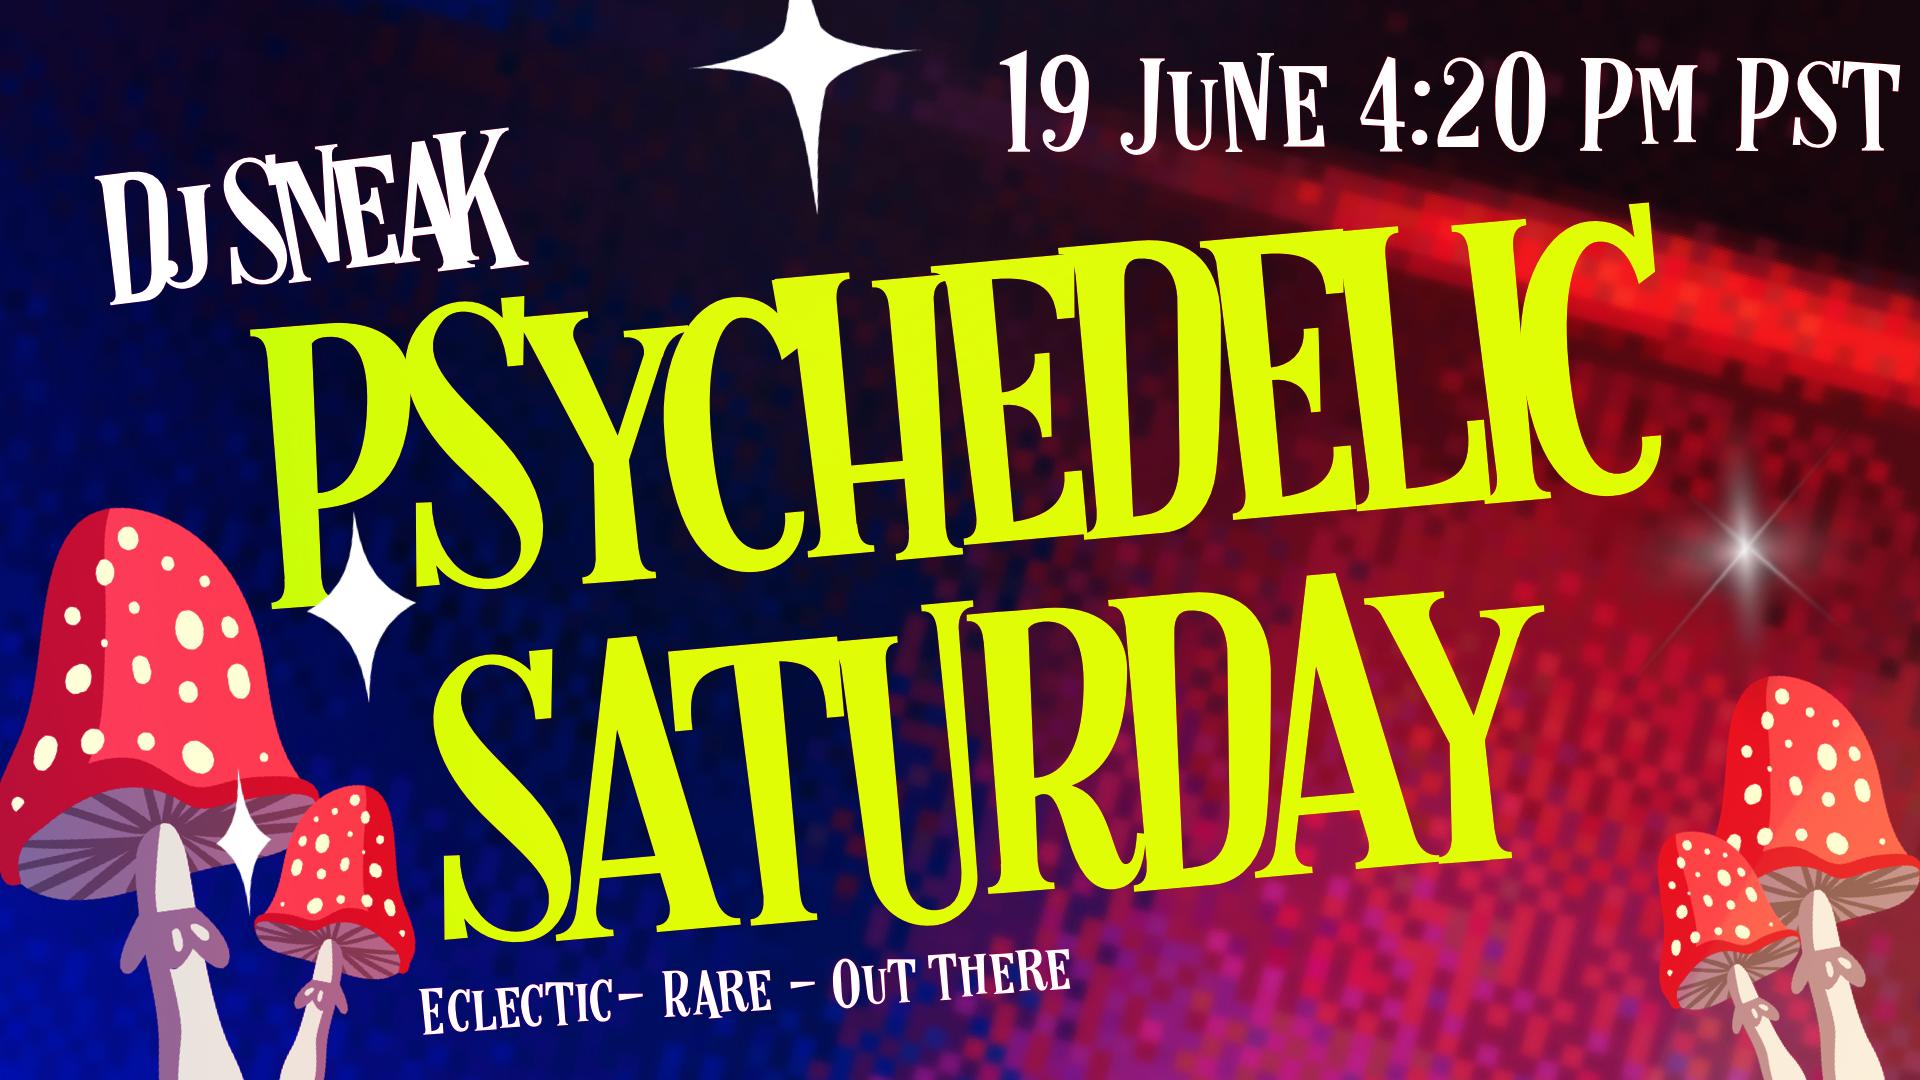 DJ Sneak Psychedelic Saturdays